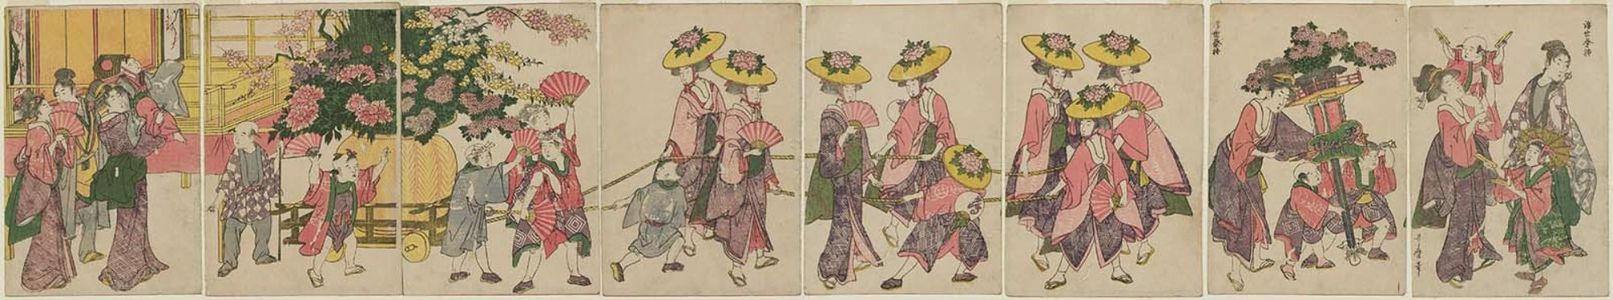 Kitagawa Utamaro: A Floating World Festival (Ukiyo sairei) - Museum of Fine Arts